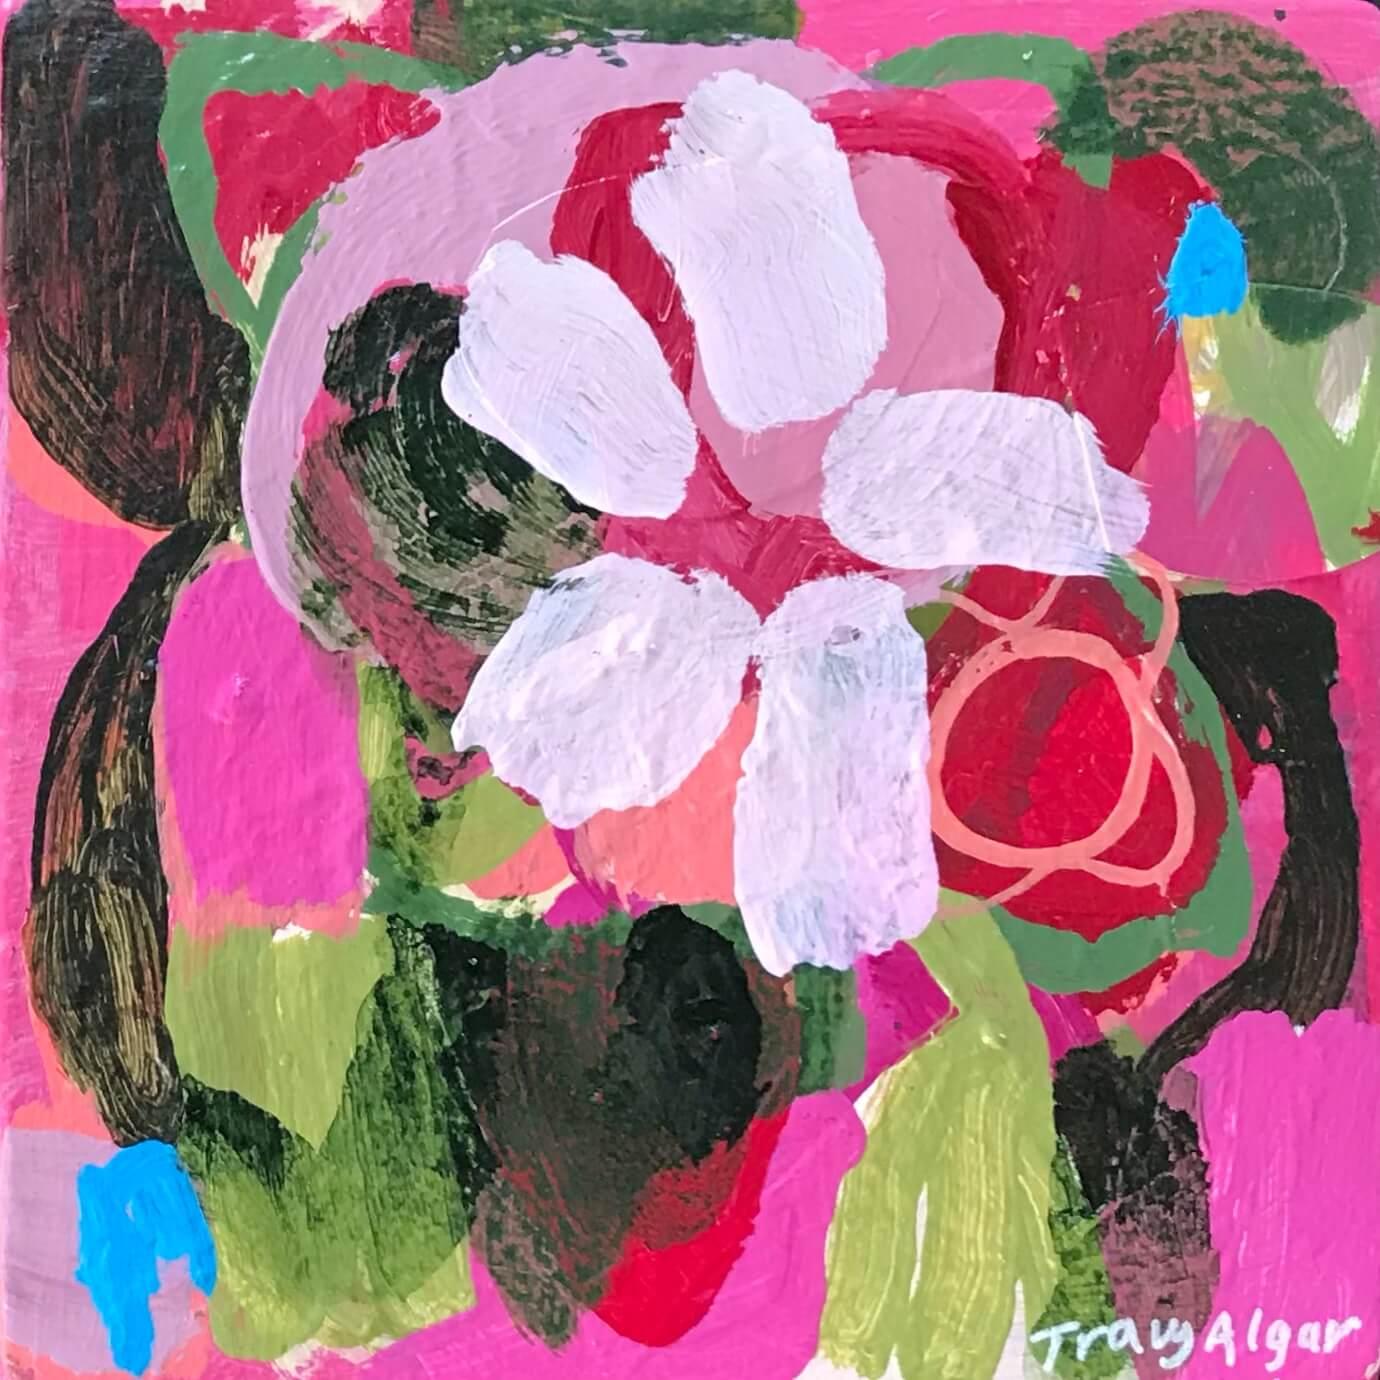 Blom 2, abstract flower artwork by Tracy Algar